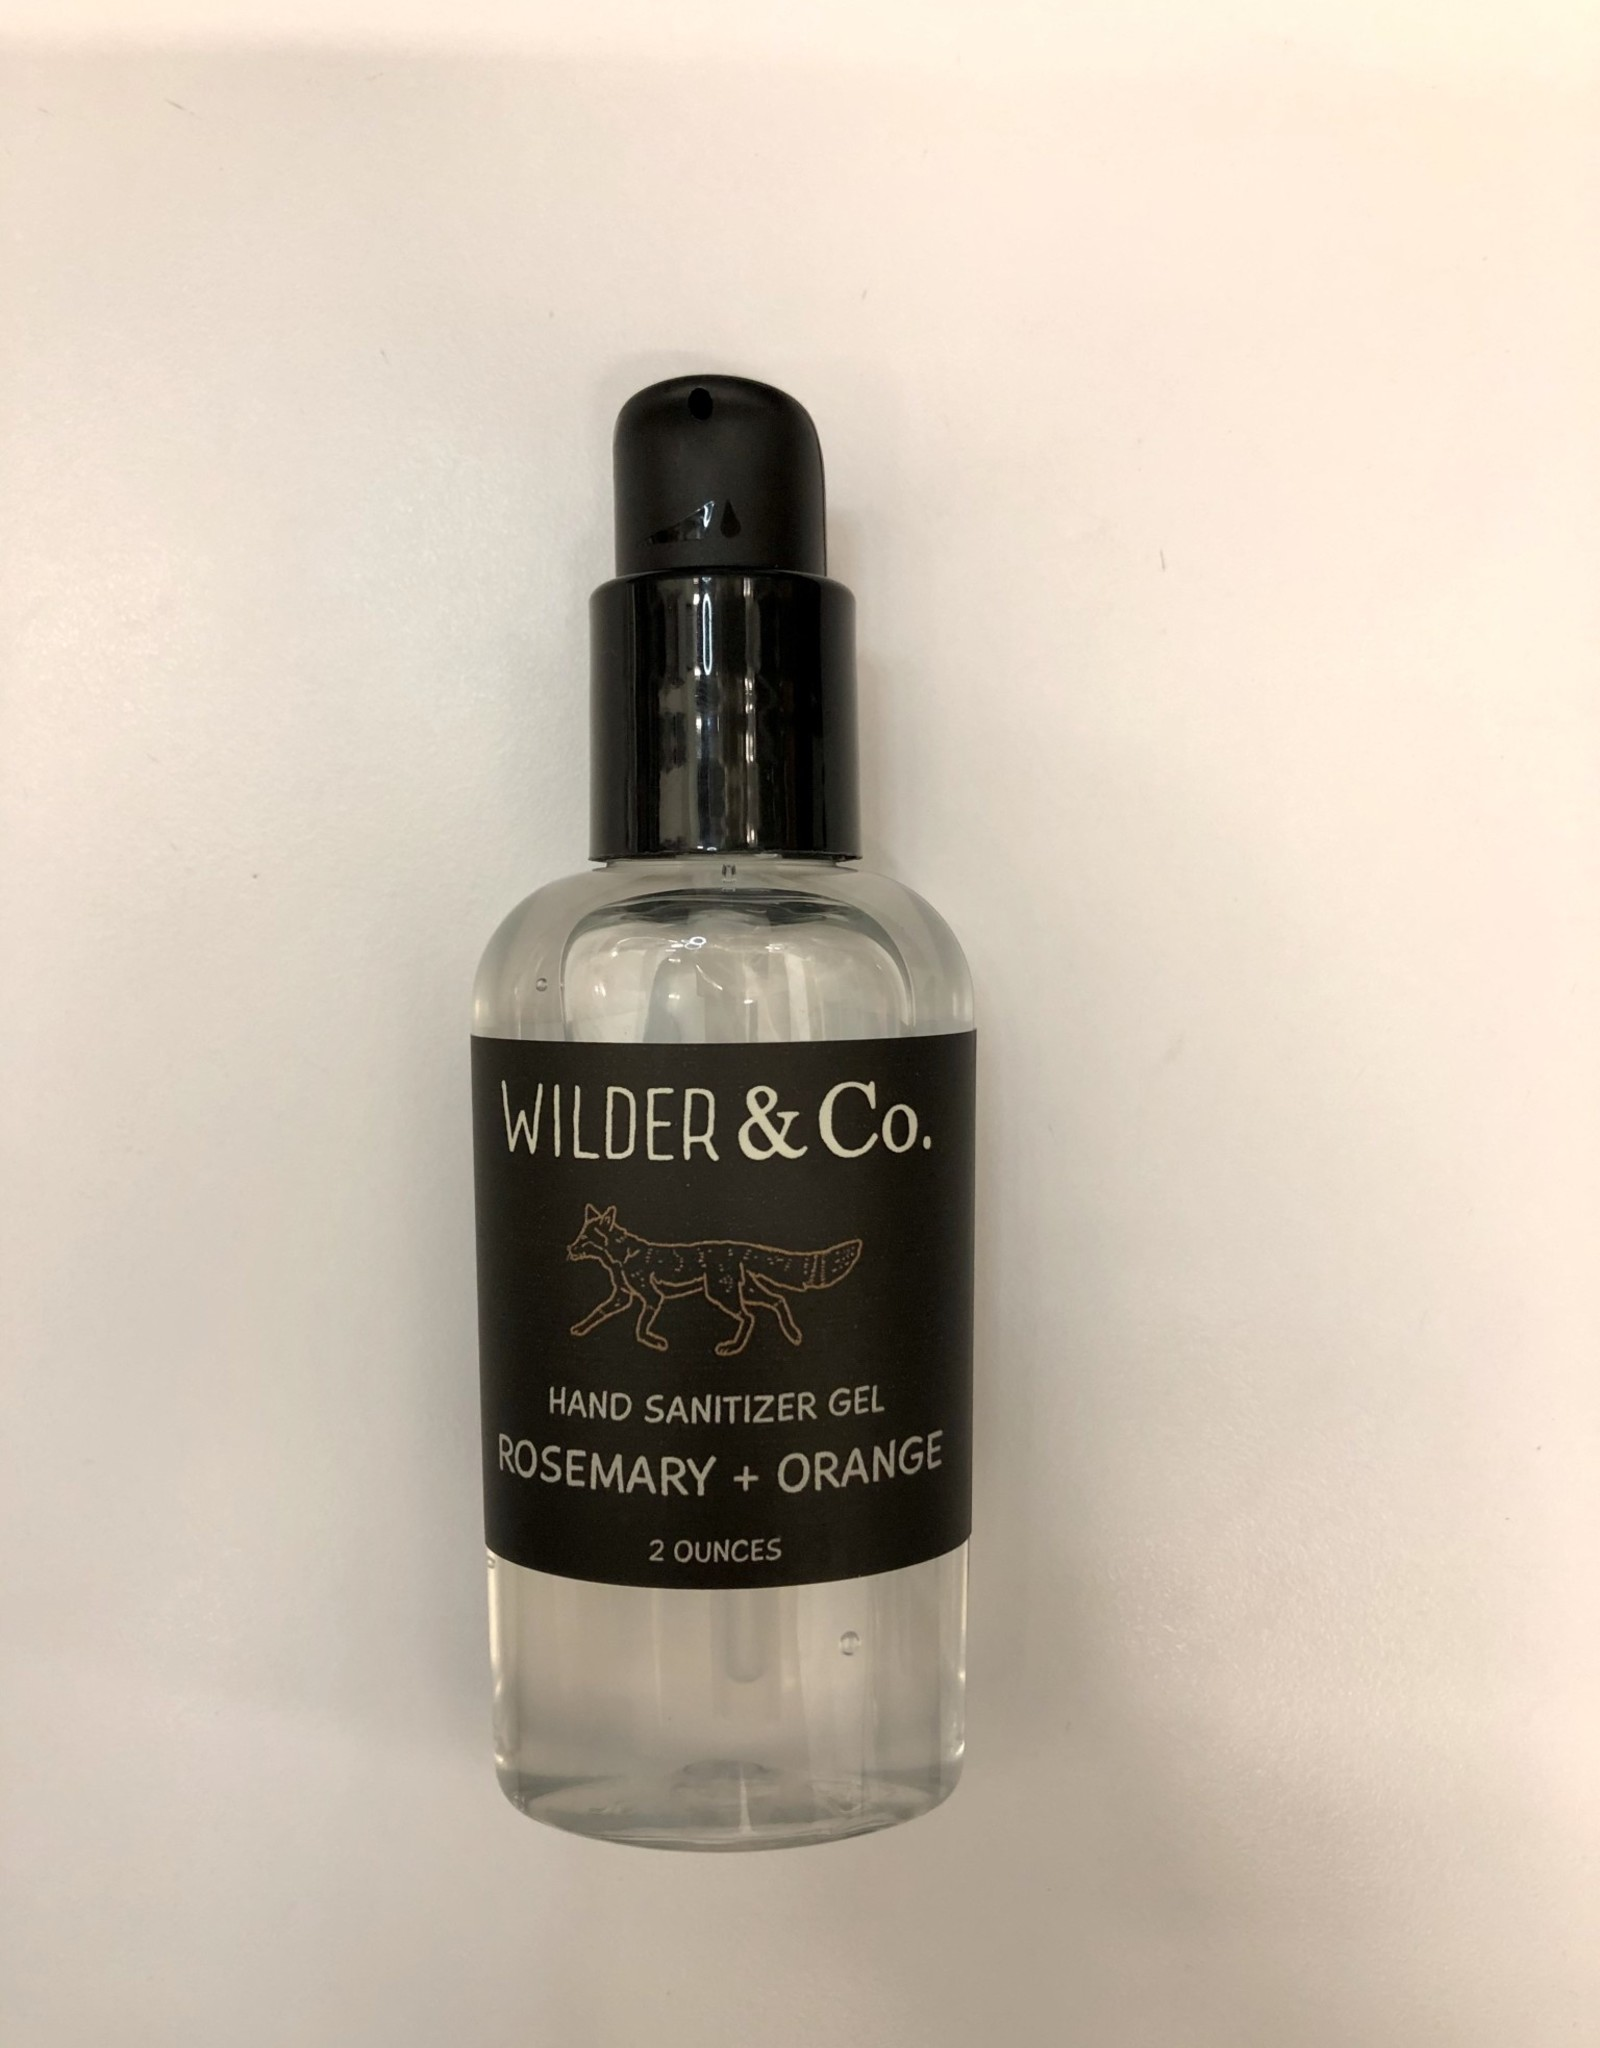 Wilder & Co Hand Sanitizer Rosemary + Orange 2 oz